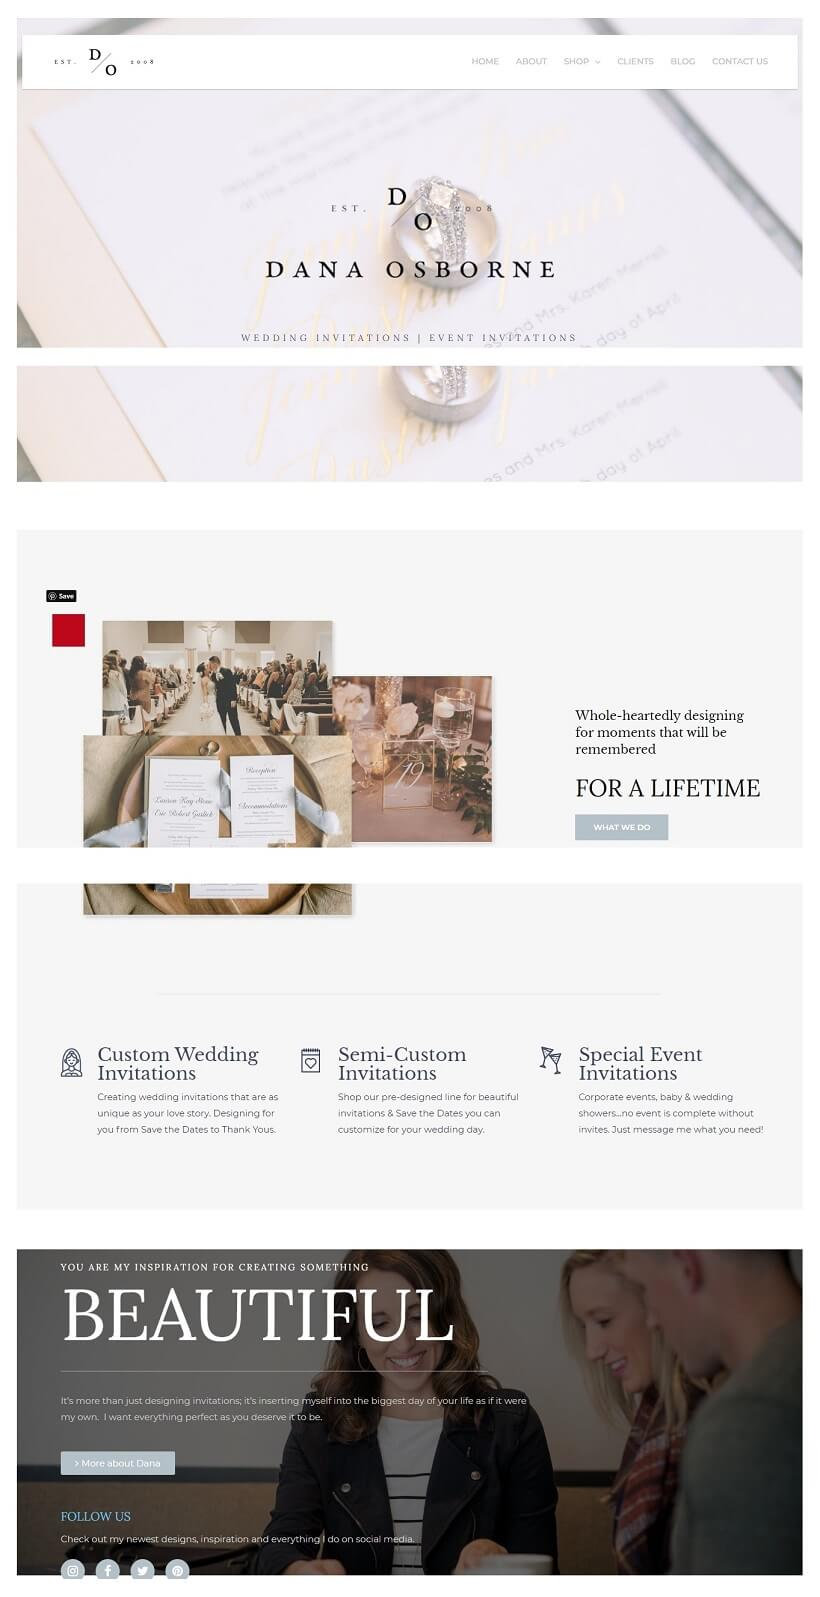 astra-wordpress-theme-event-wedding-website-example-dana-osborne-design